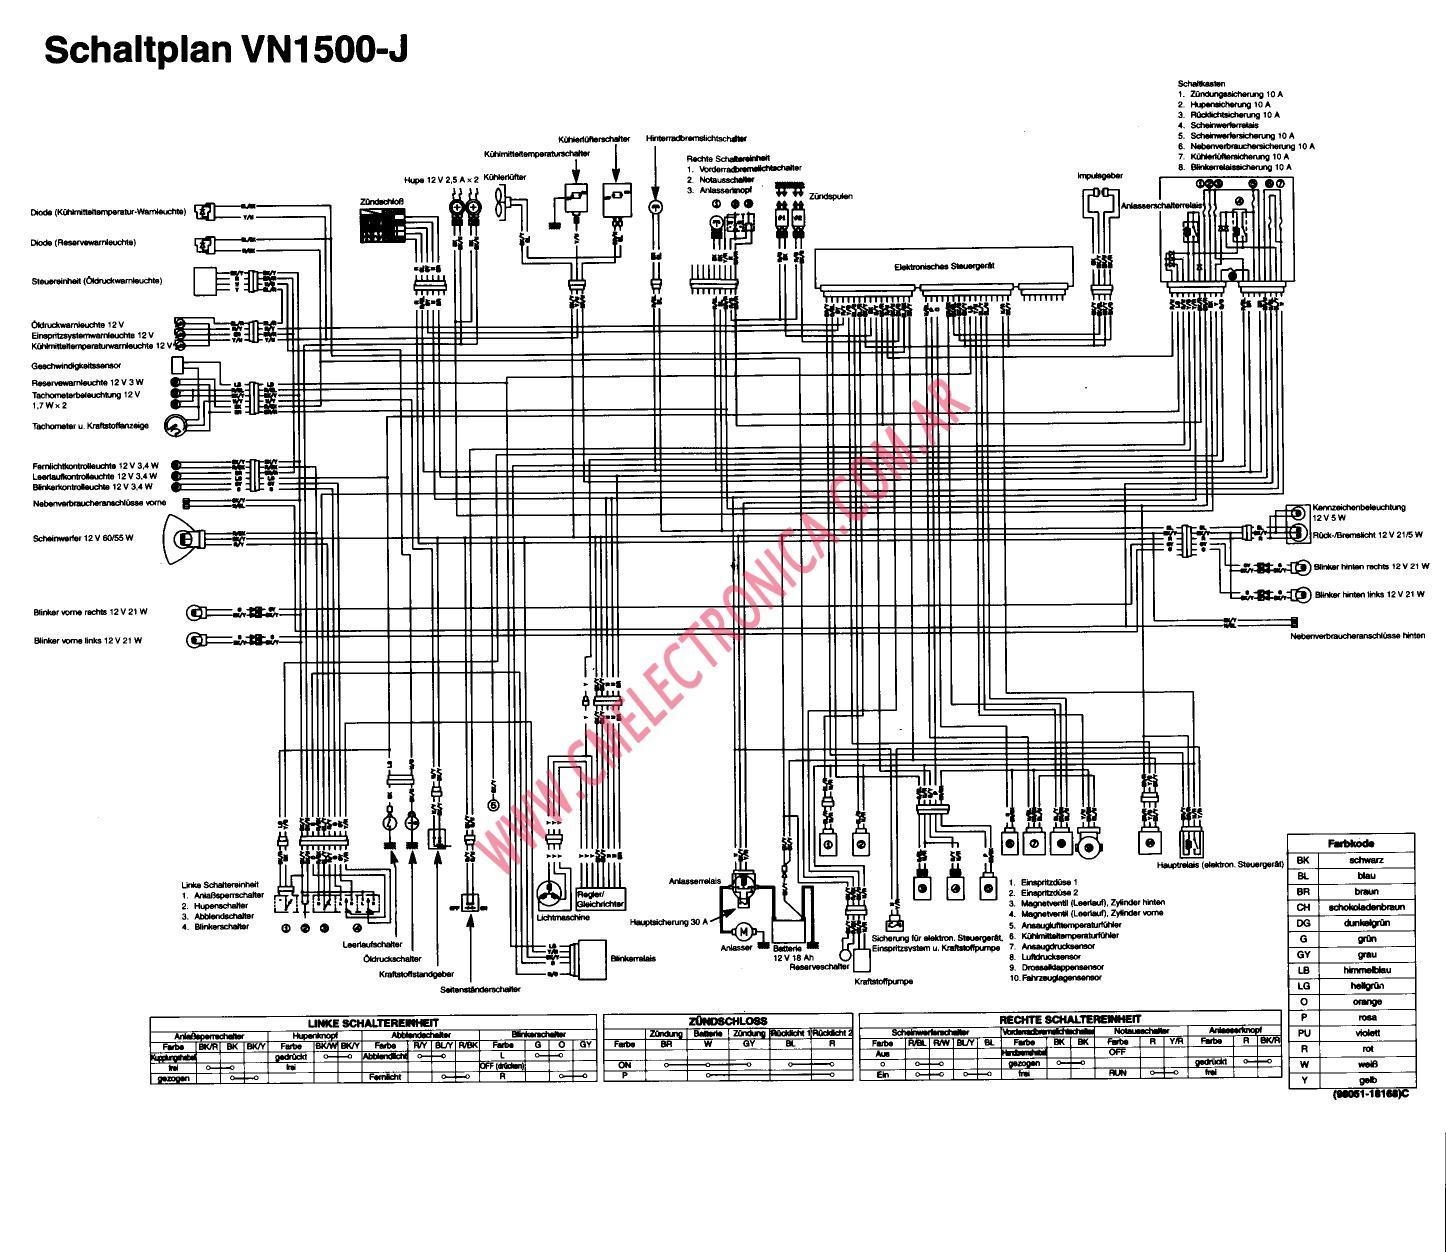 1998 vulcan 1500 wiring diagram